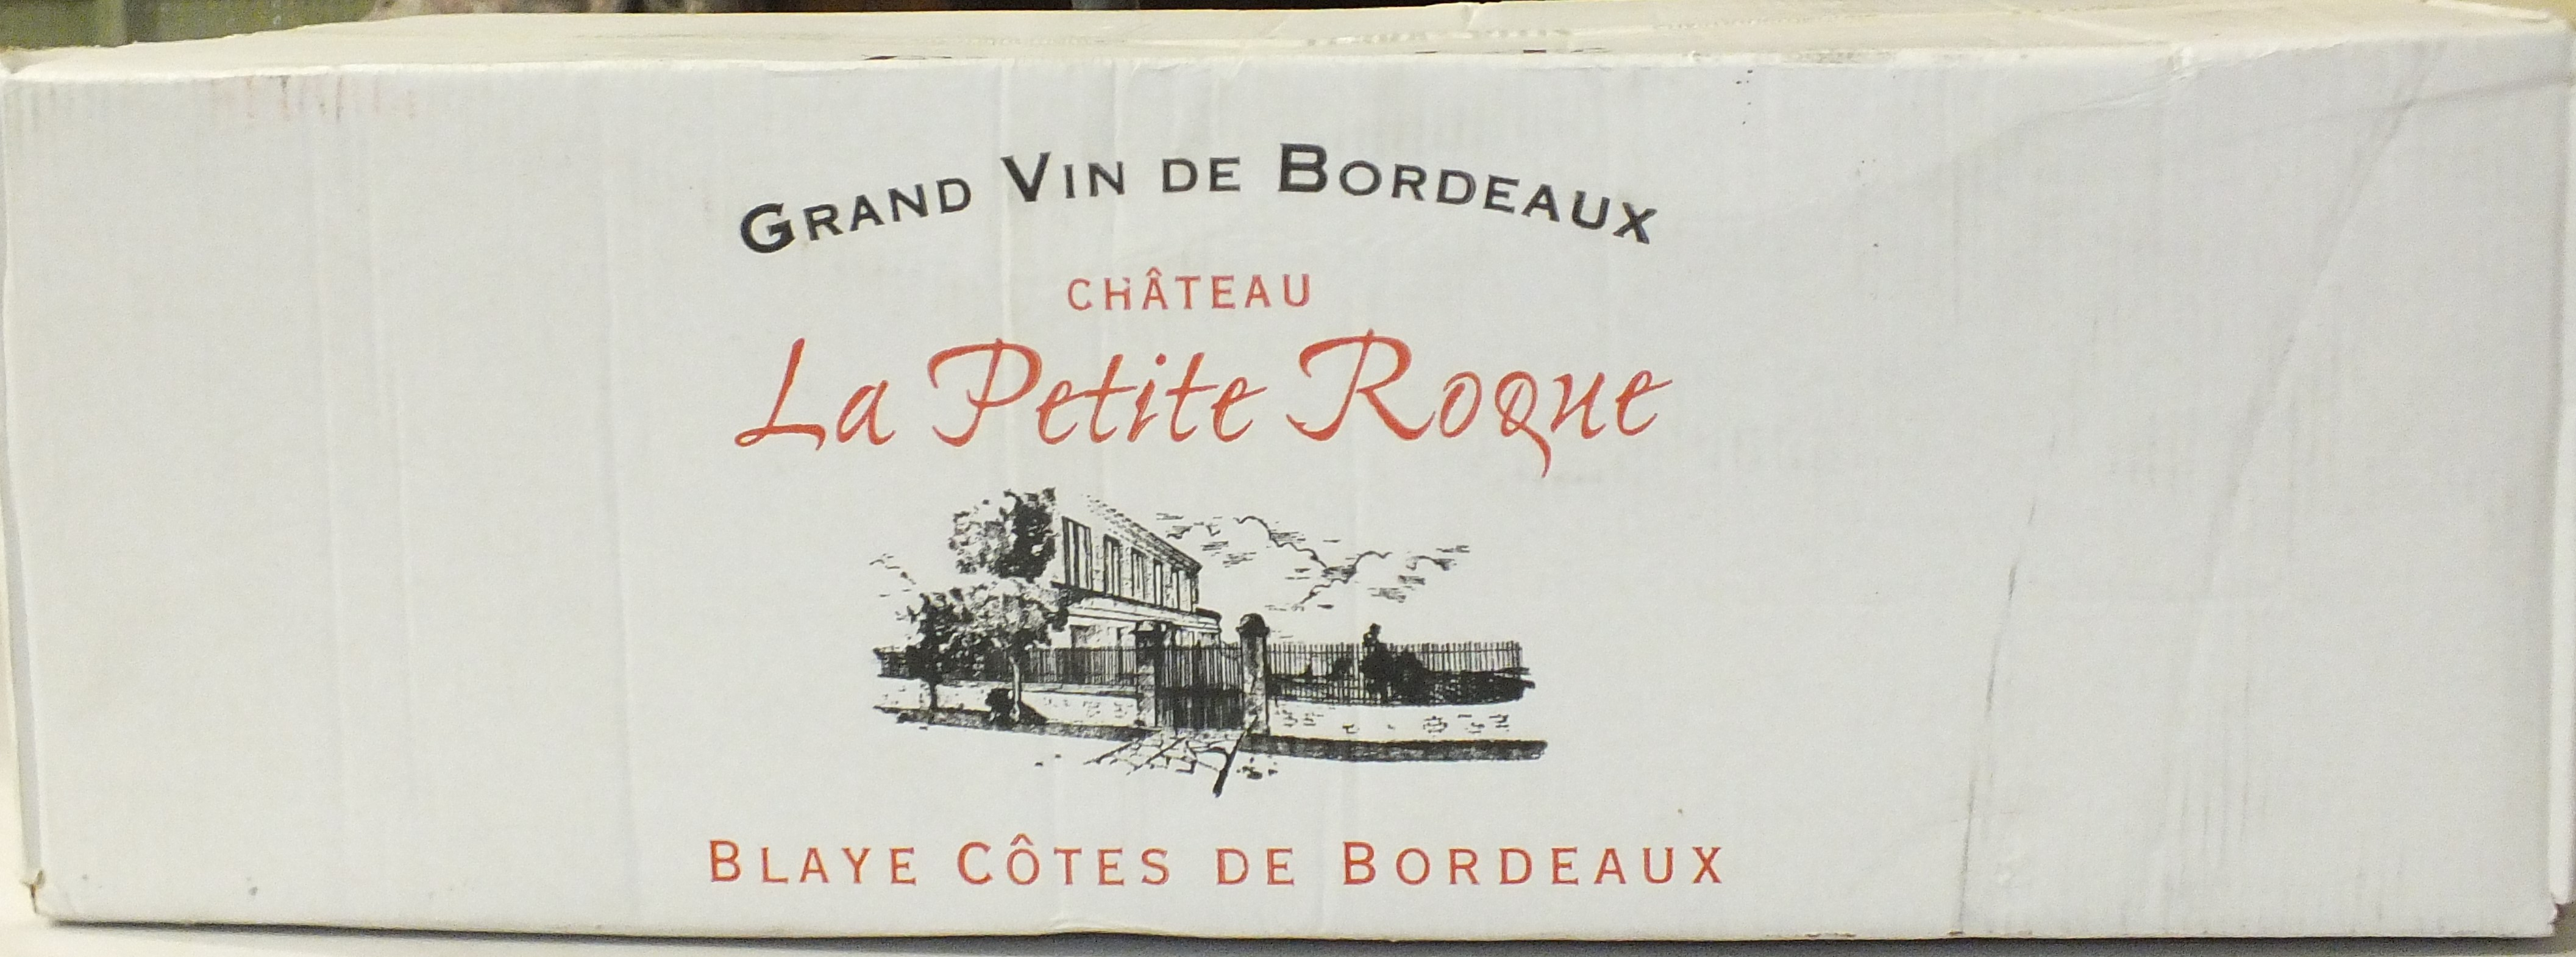 Chateau La Petit Roque Blaye, twelve bottles, in cardboard case.